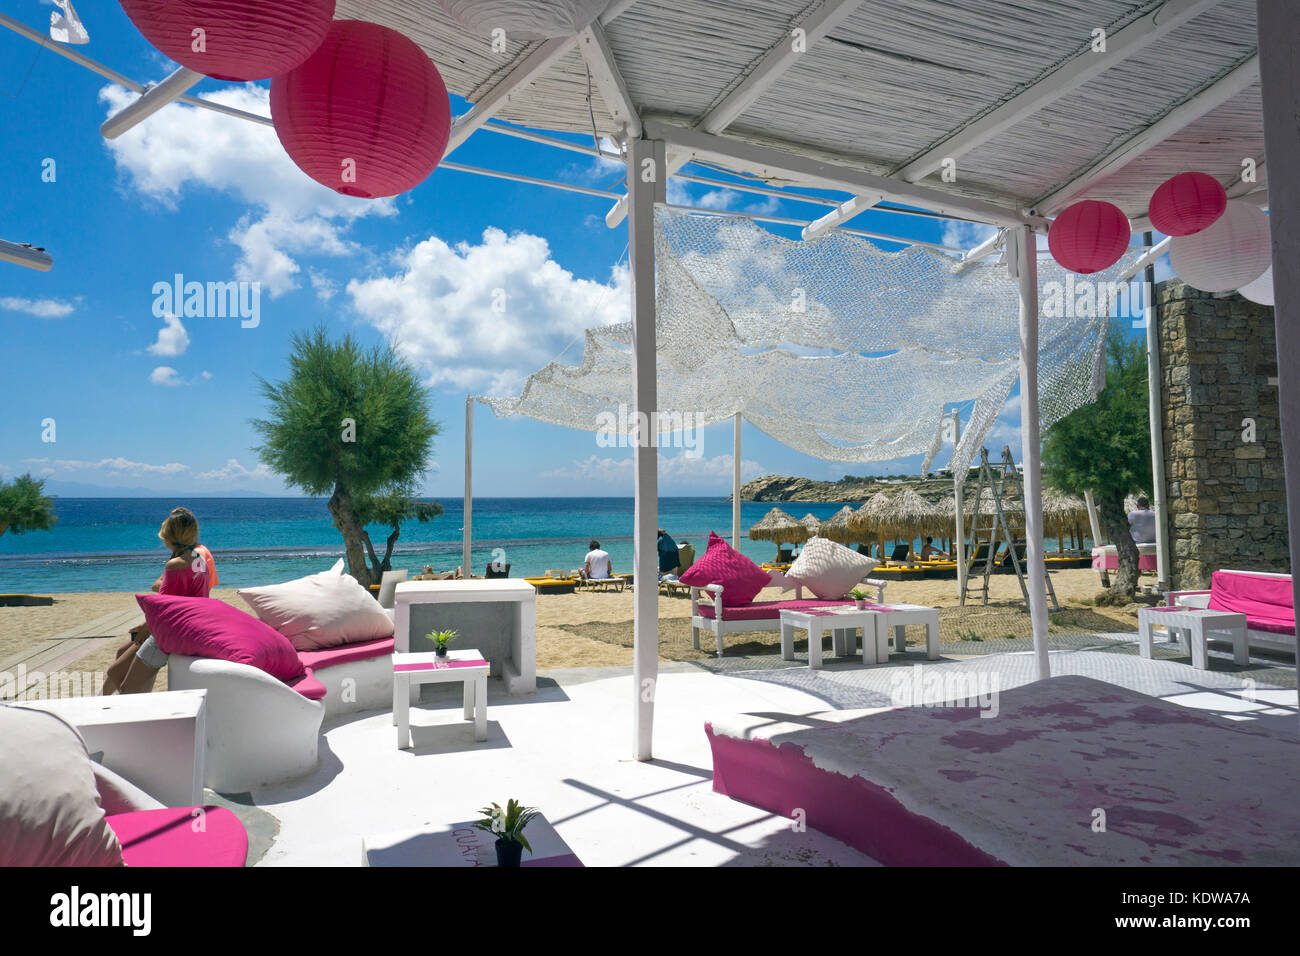 Tourists at beach bar, Paradise beach, Mykonos - Stock Image